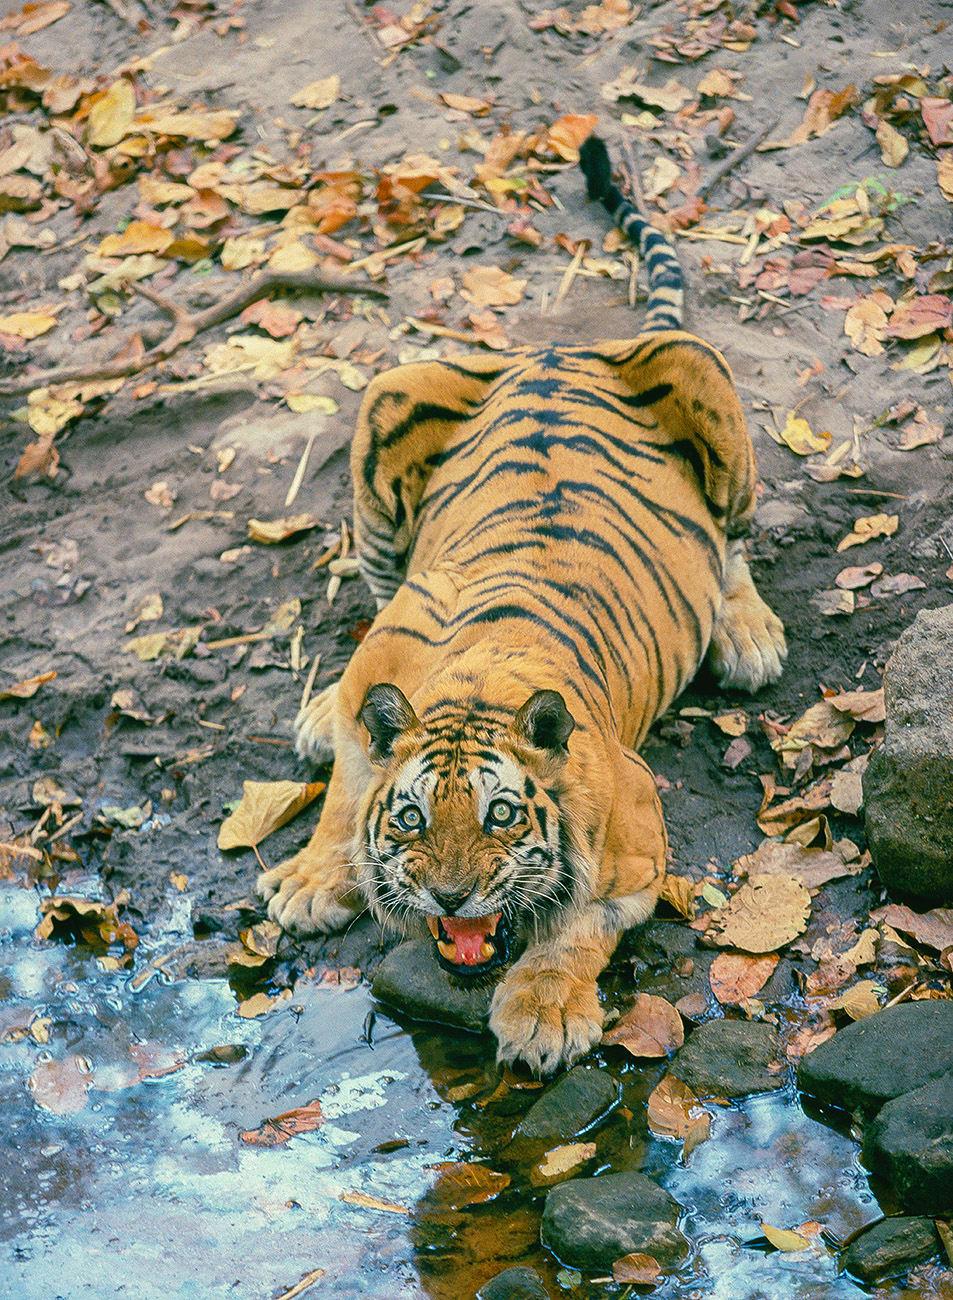 A tiger charges at a tourist at Bandhavgarh National Park. Photo: Jagdeep Rajput, late 1990s